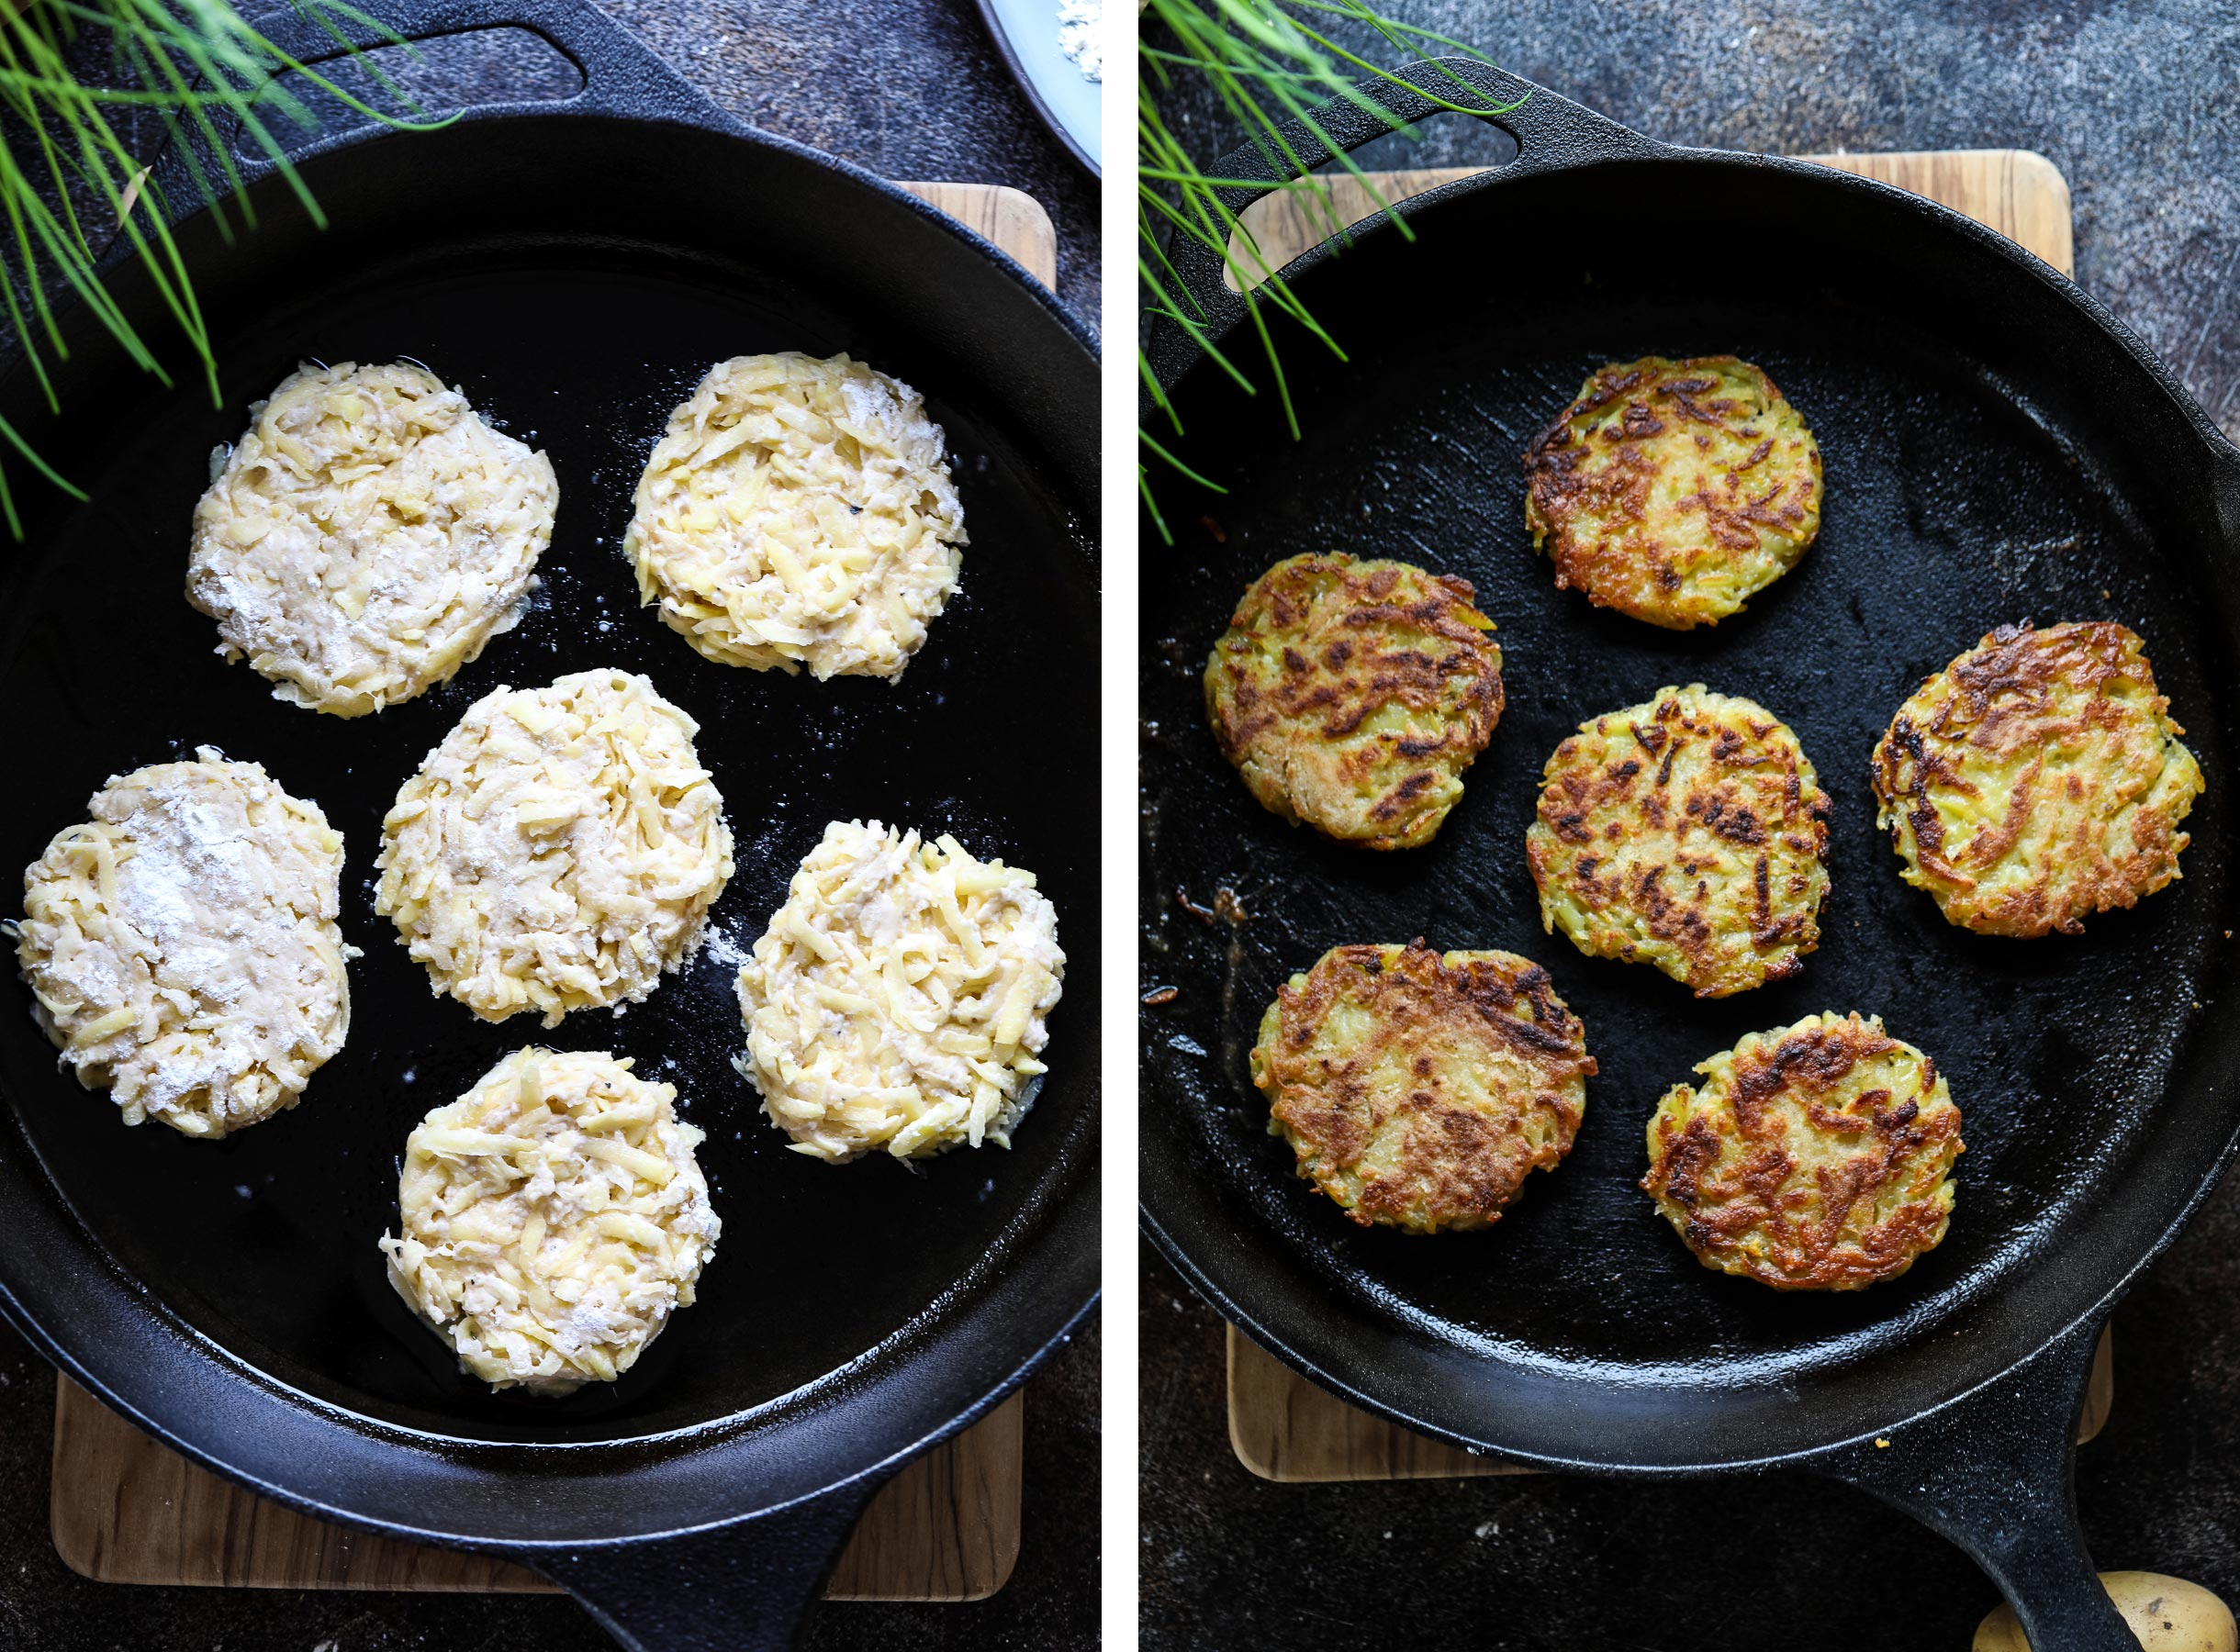 Frying Kartoffelpuffer on the pan.